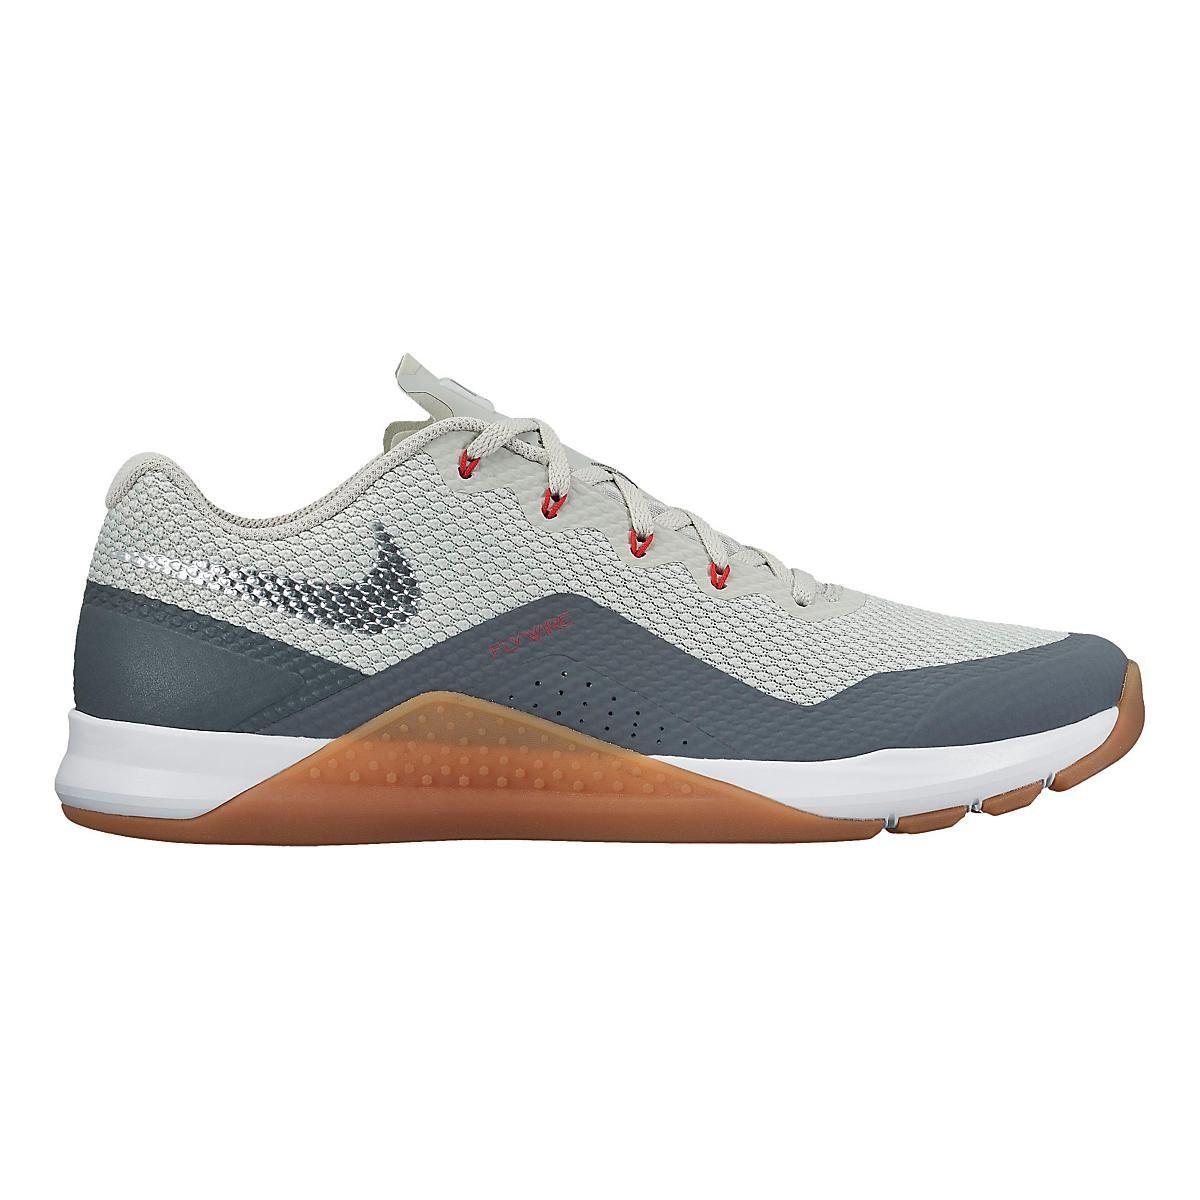 Nike Metcon Repper Dsx Pale Grey Gum Medium Dark Grey Metallic Silver Size 14 Also Like Binary Blue If Grey Is Out Hot Nike Shoes Nike Metcon Nike Men